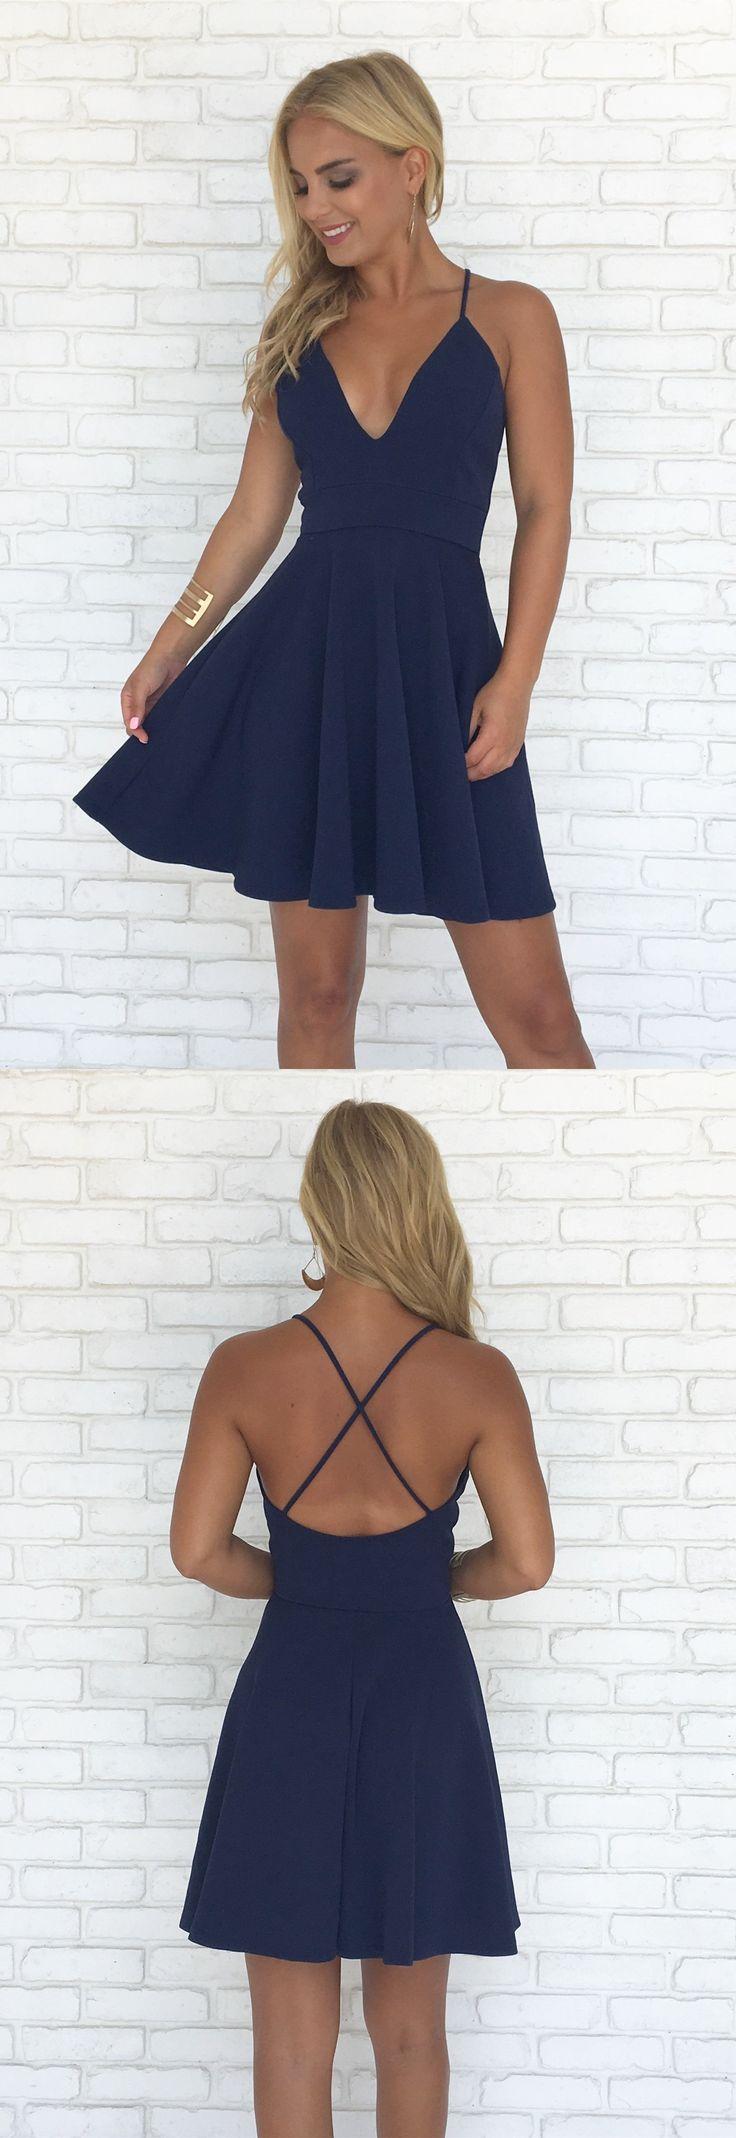 short homecoming dresses, navy blue short chiffon homecoming dress, 2017 short navy blue homecoming dress party dress bridesmaid dress